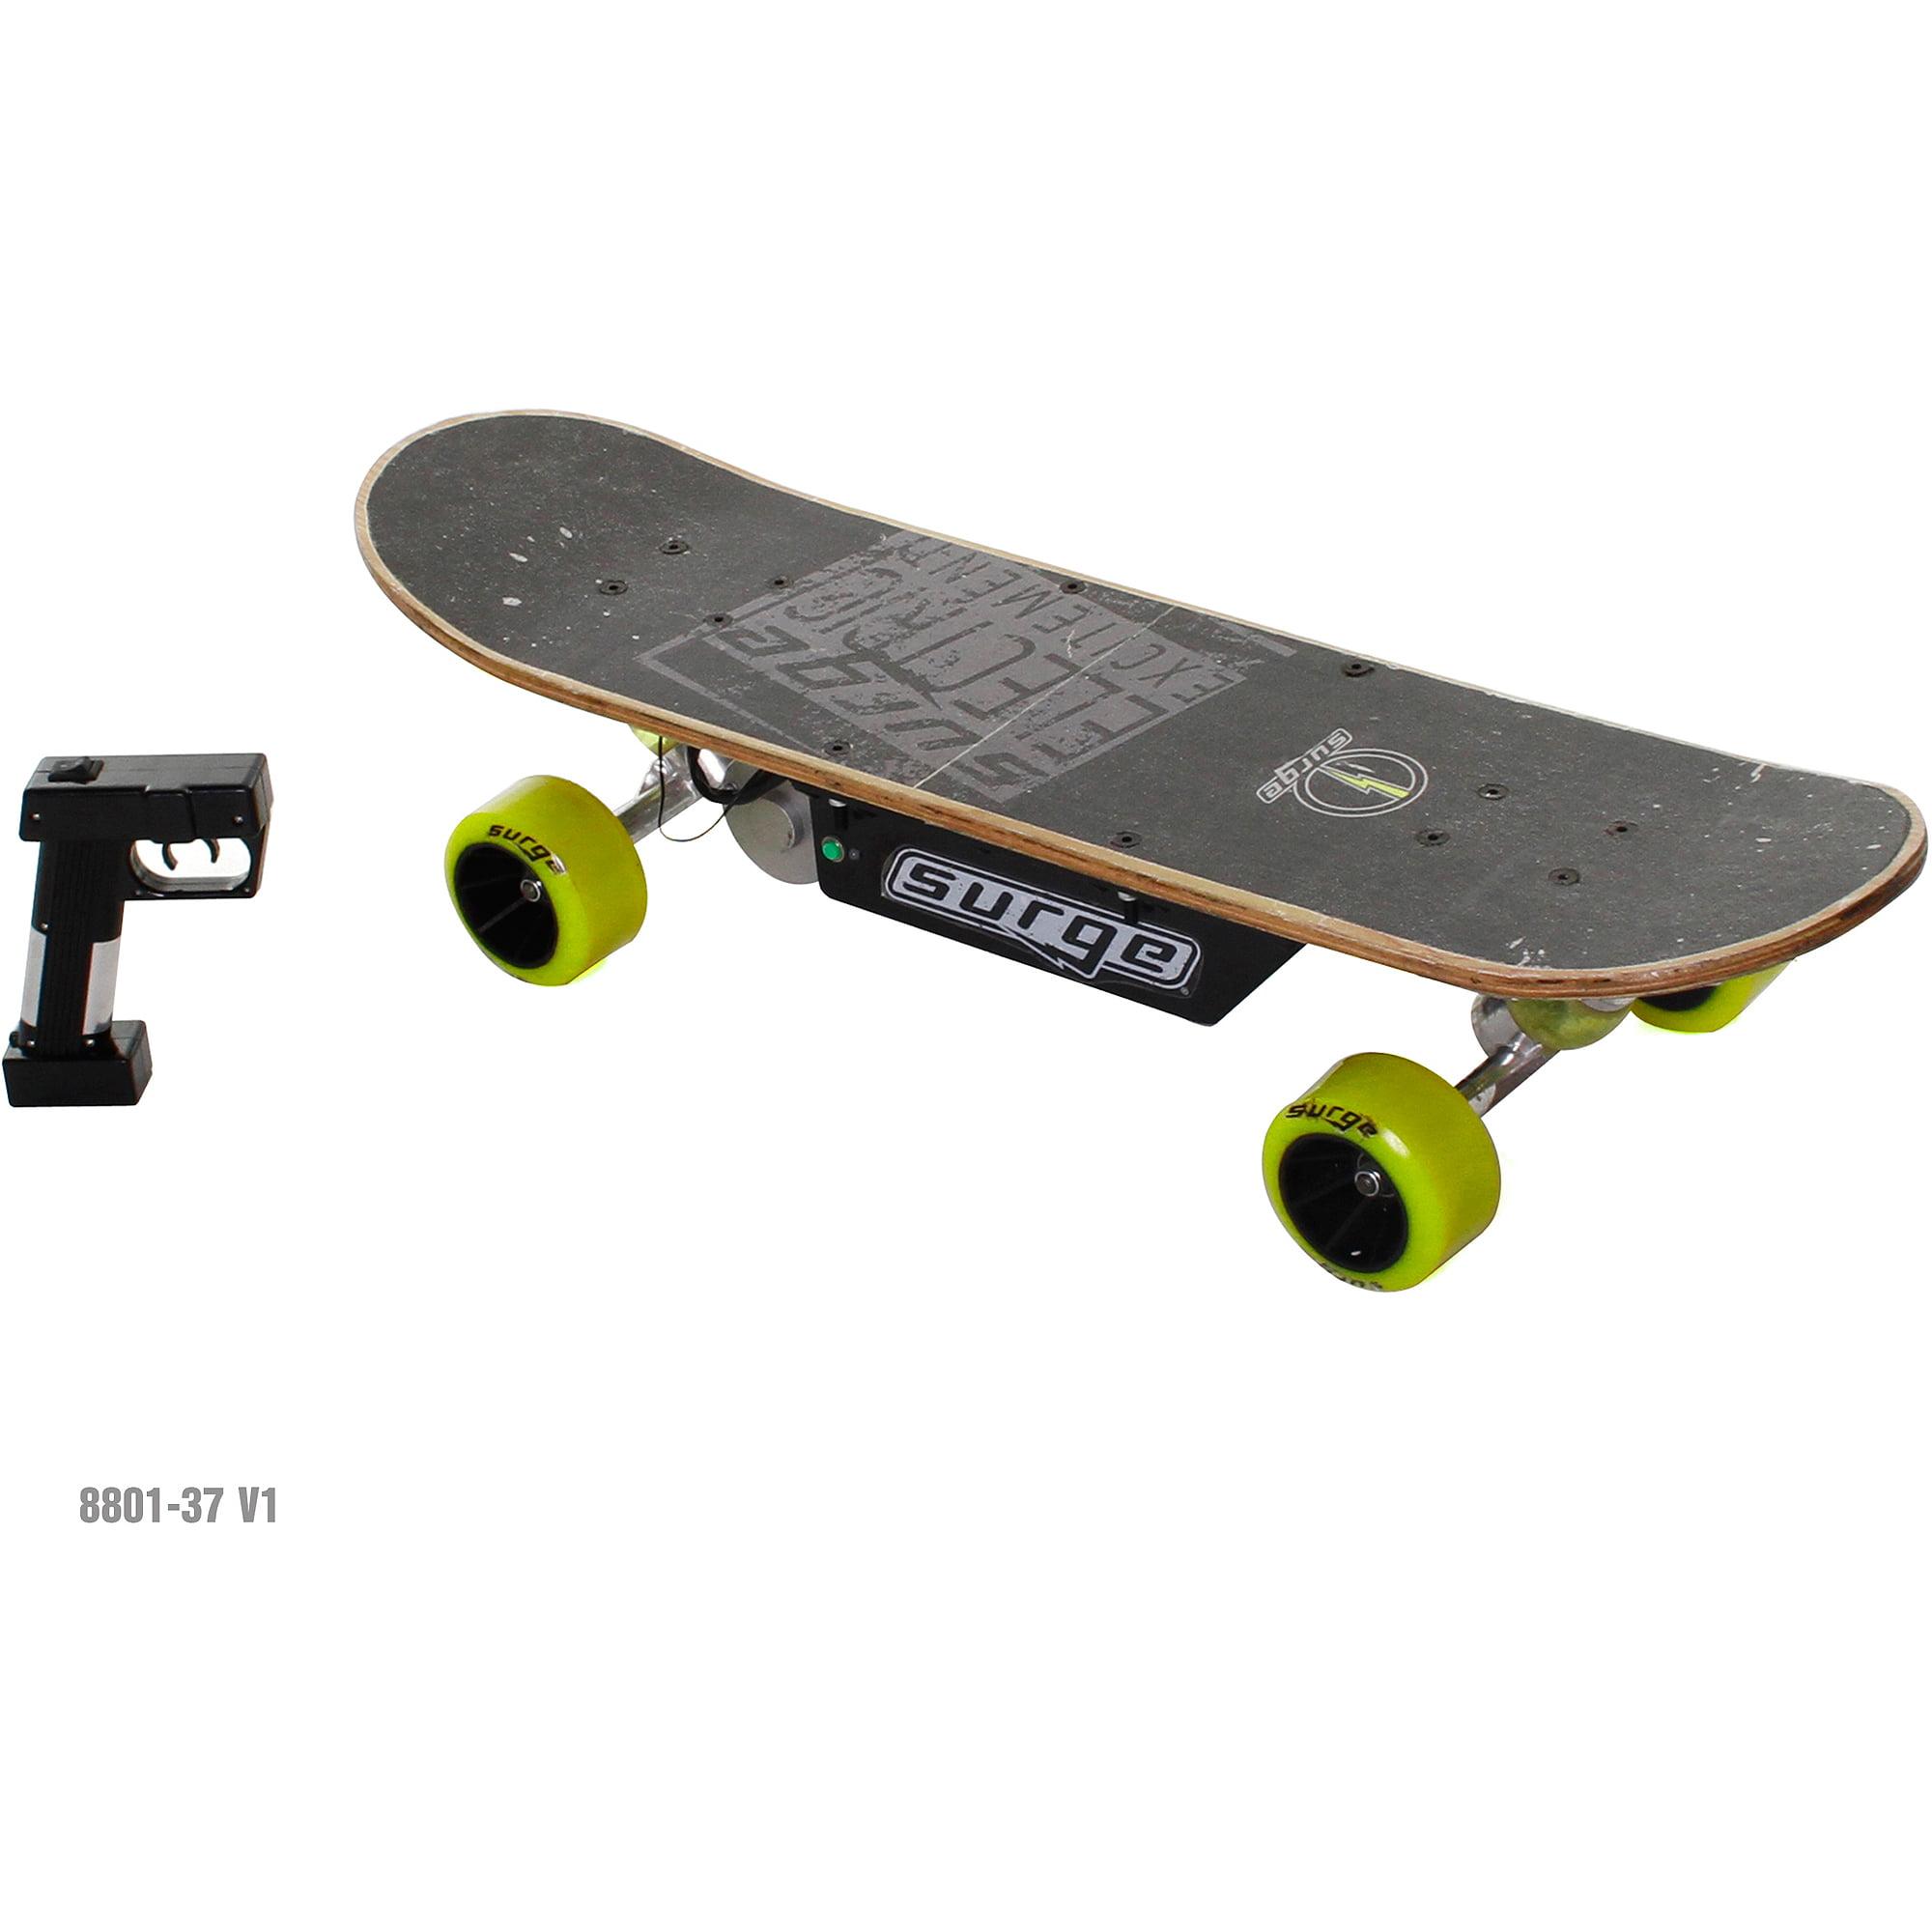 Surge Boys' 24V Electric Skateboard, Black